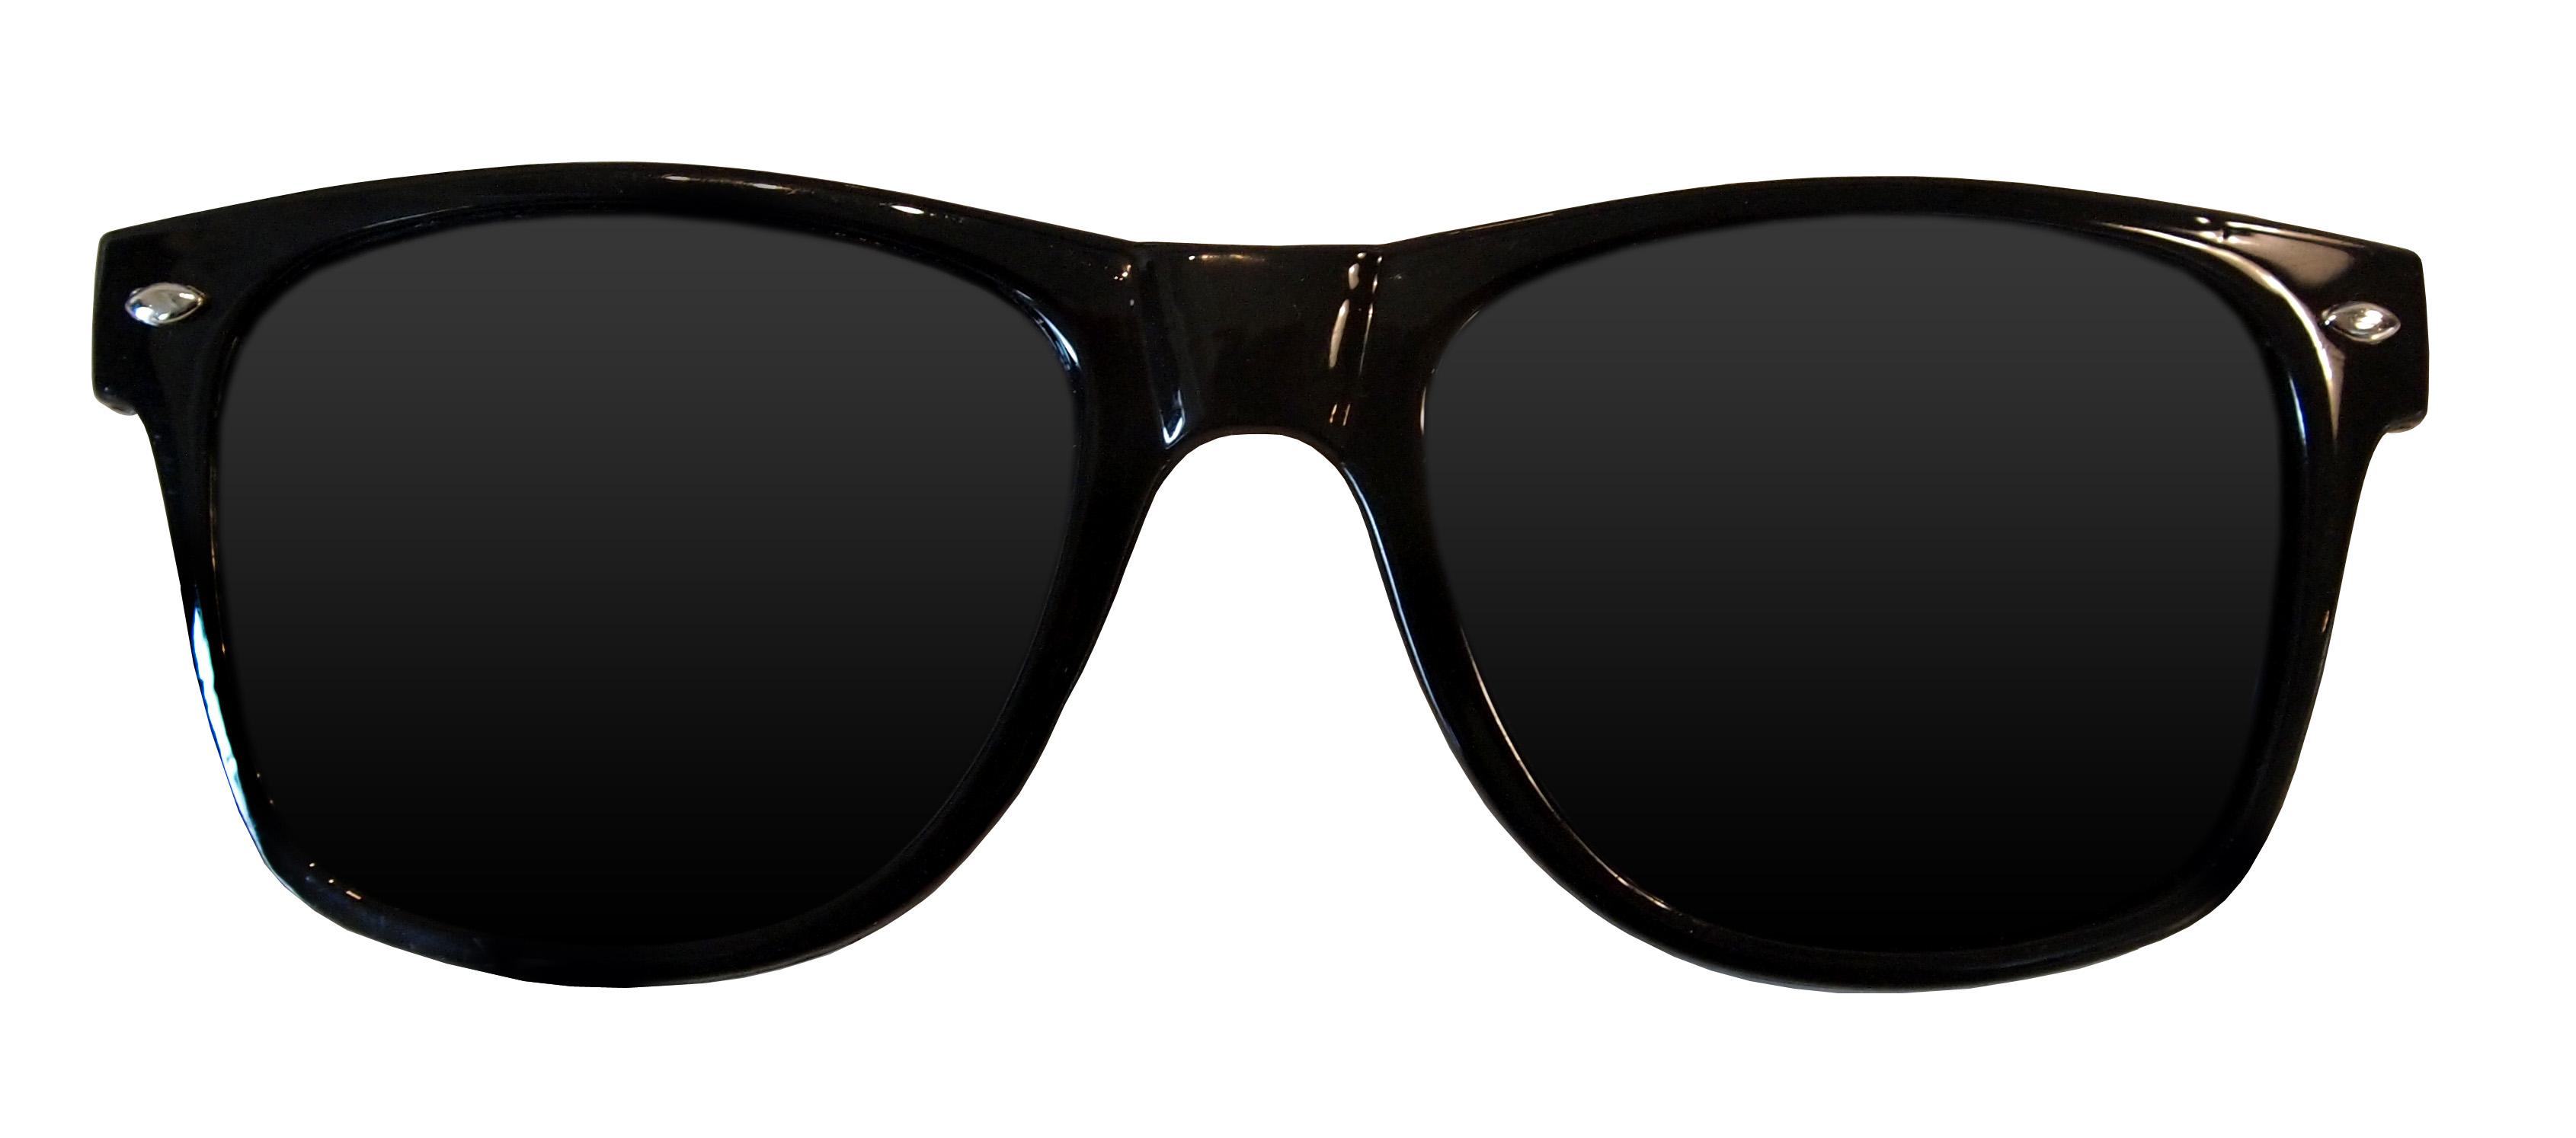 Sun Glasses Pics